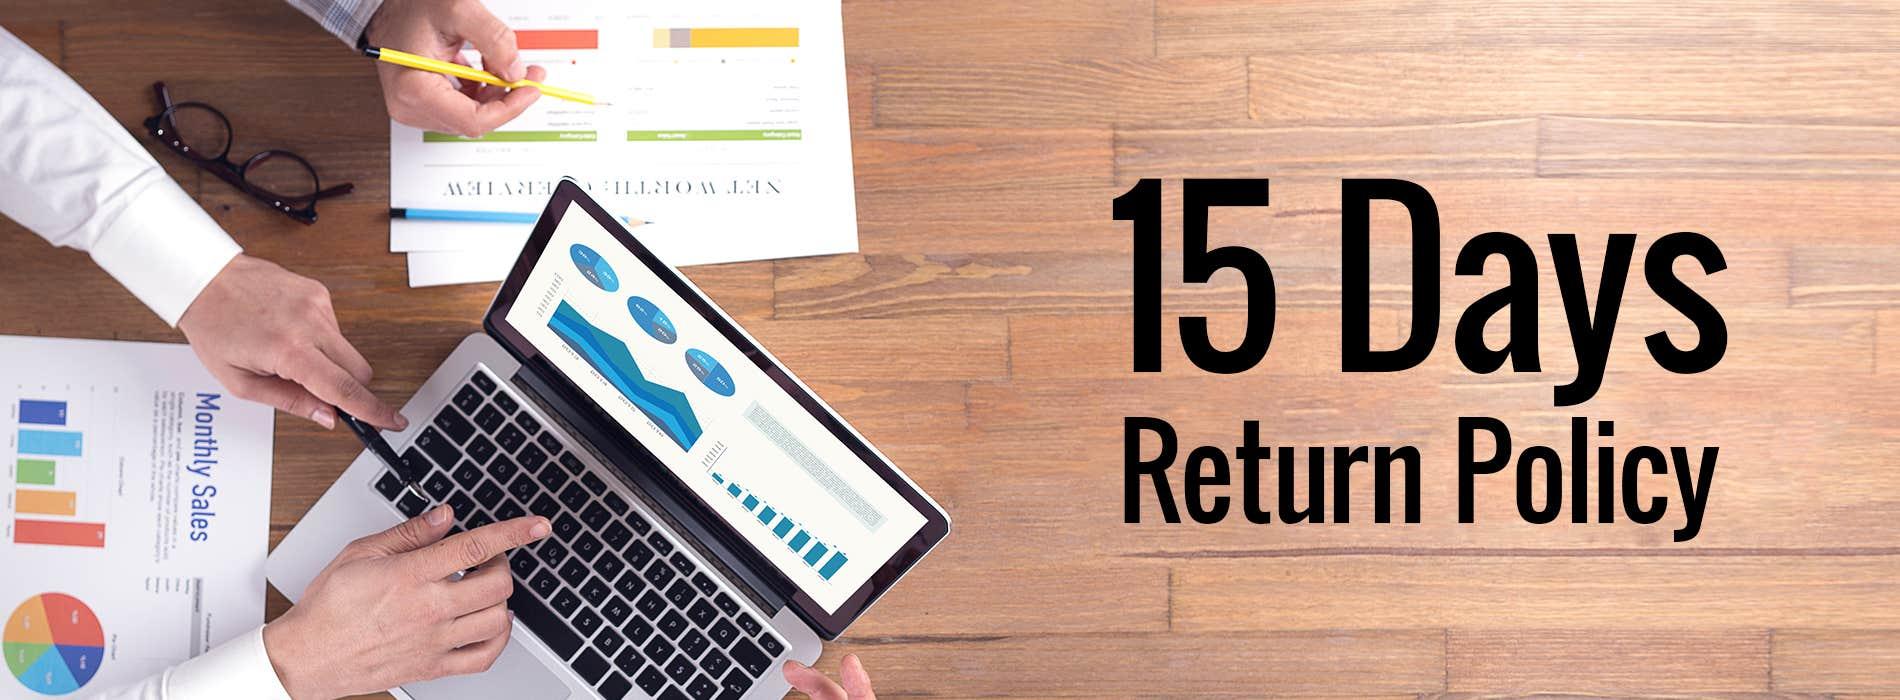 15 Days Return Policy